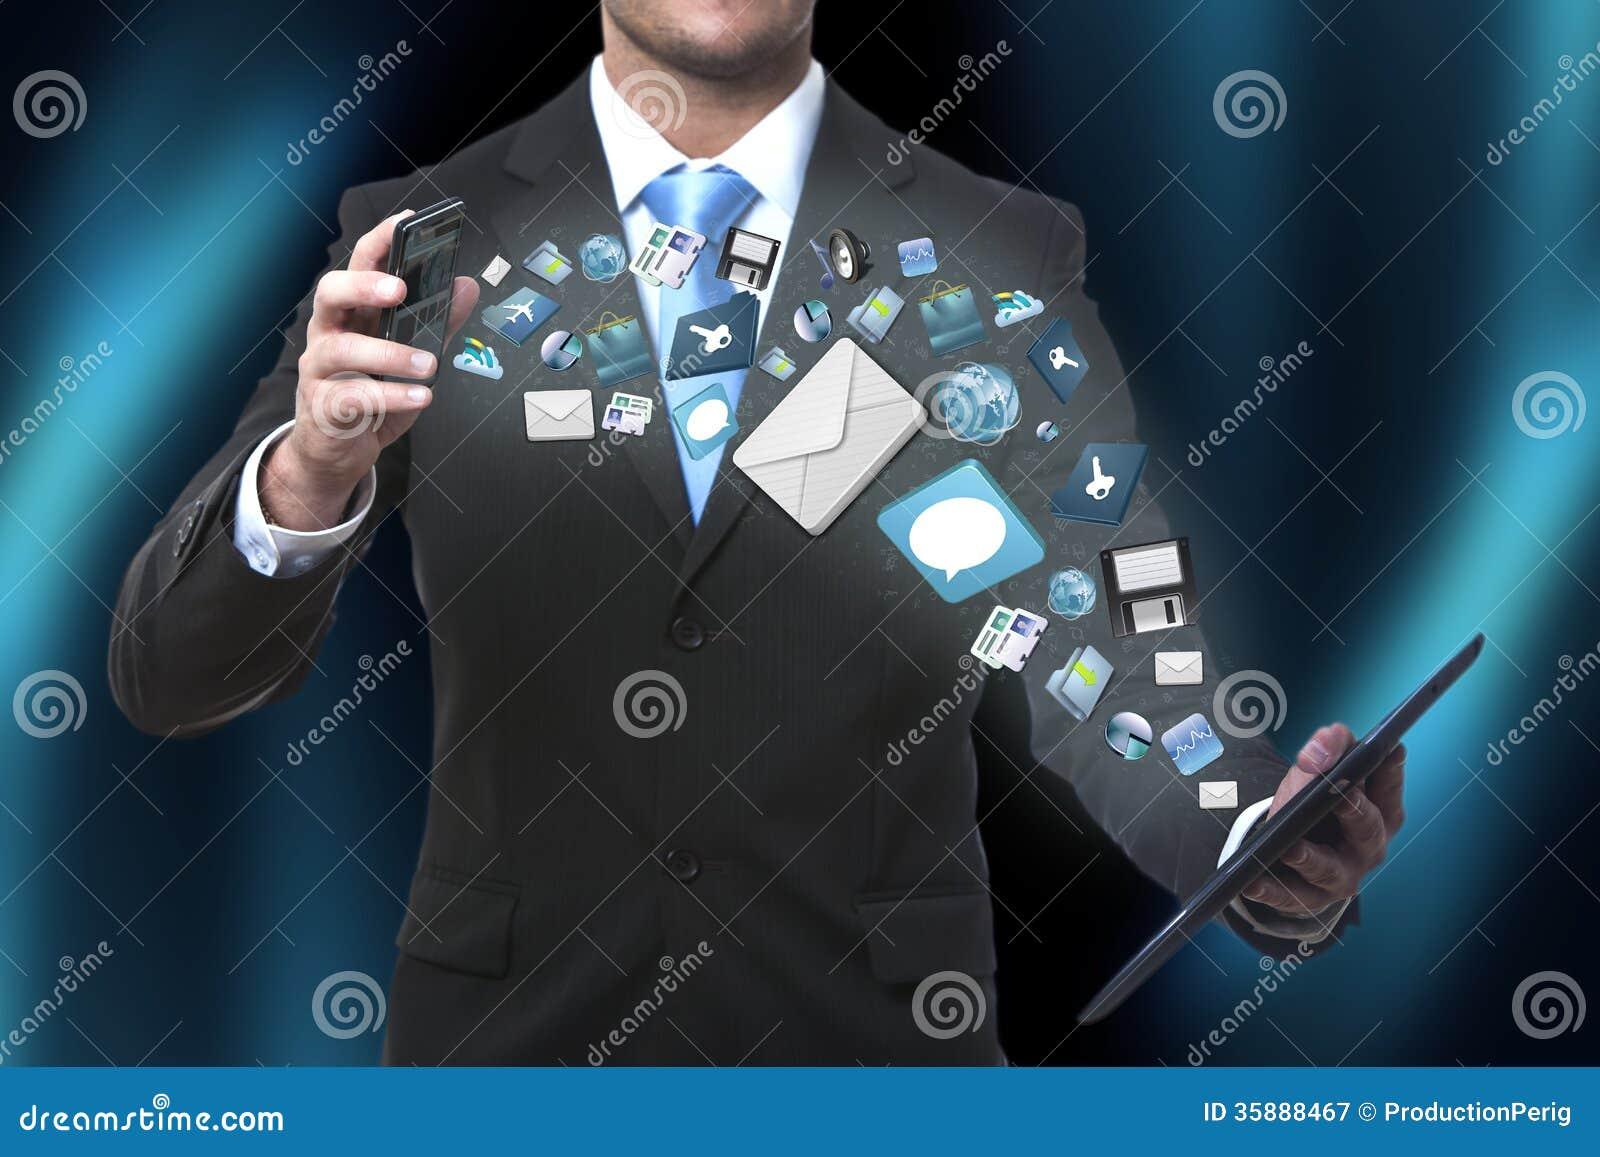 Technology Management Image: Modern Communication Technology Illustration With Mobile